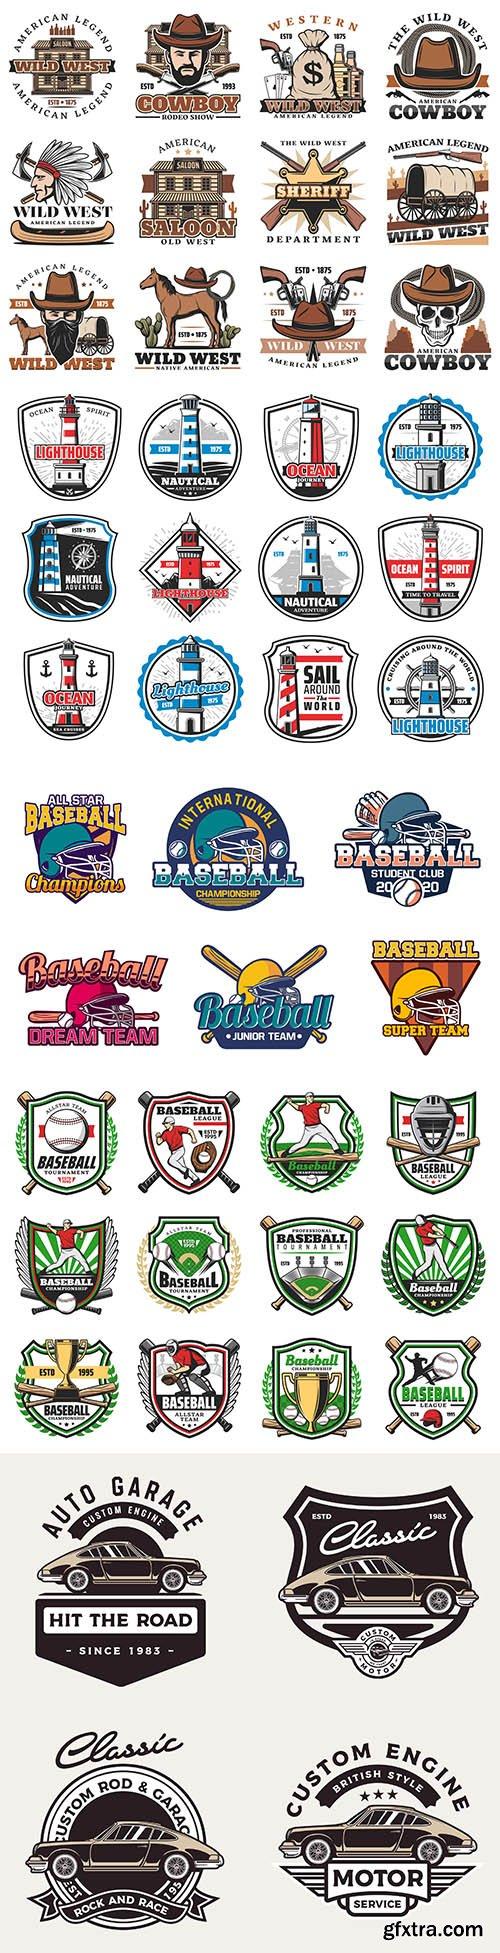 Cowboy, sports, beacon design emblems and logos